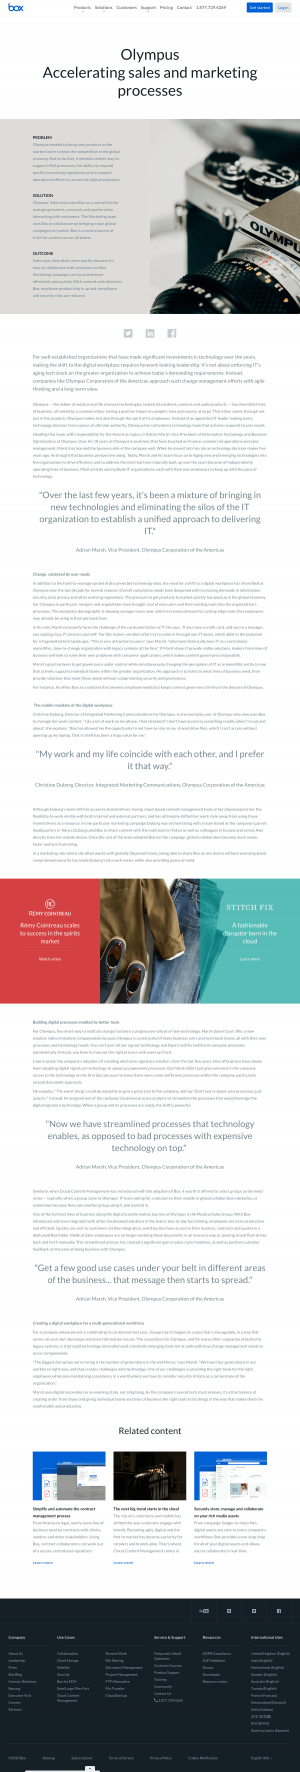 Box – Customers page 2